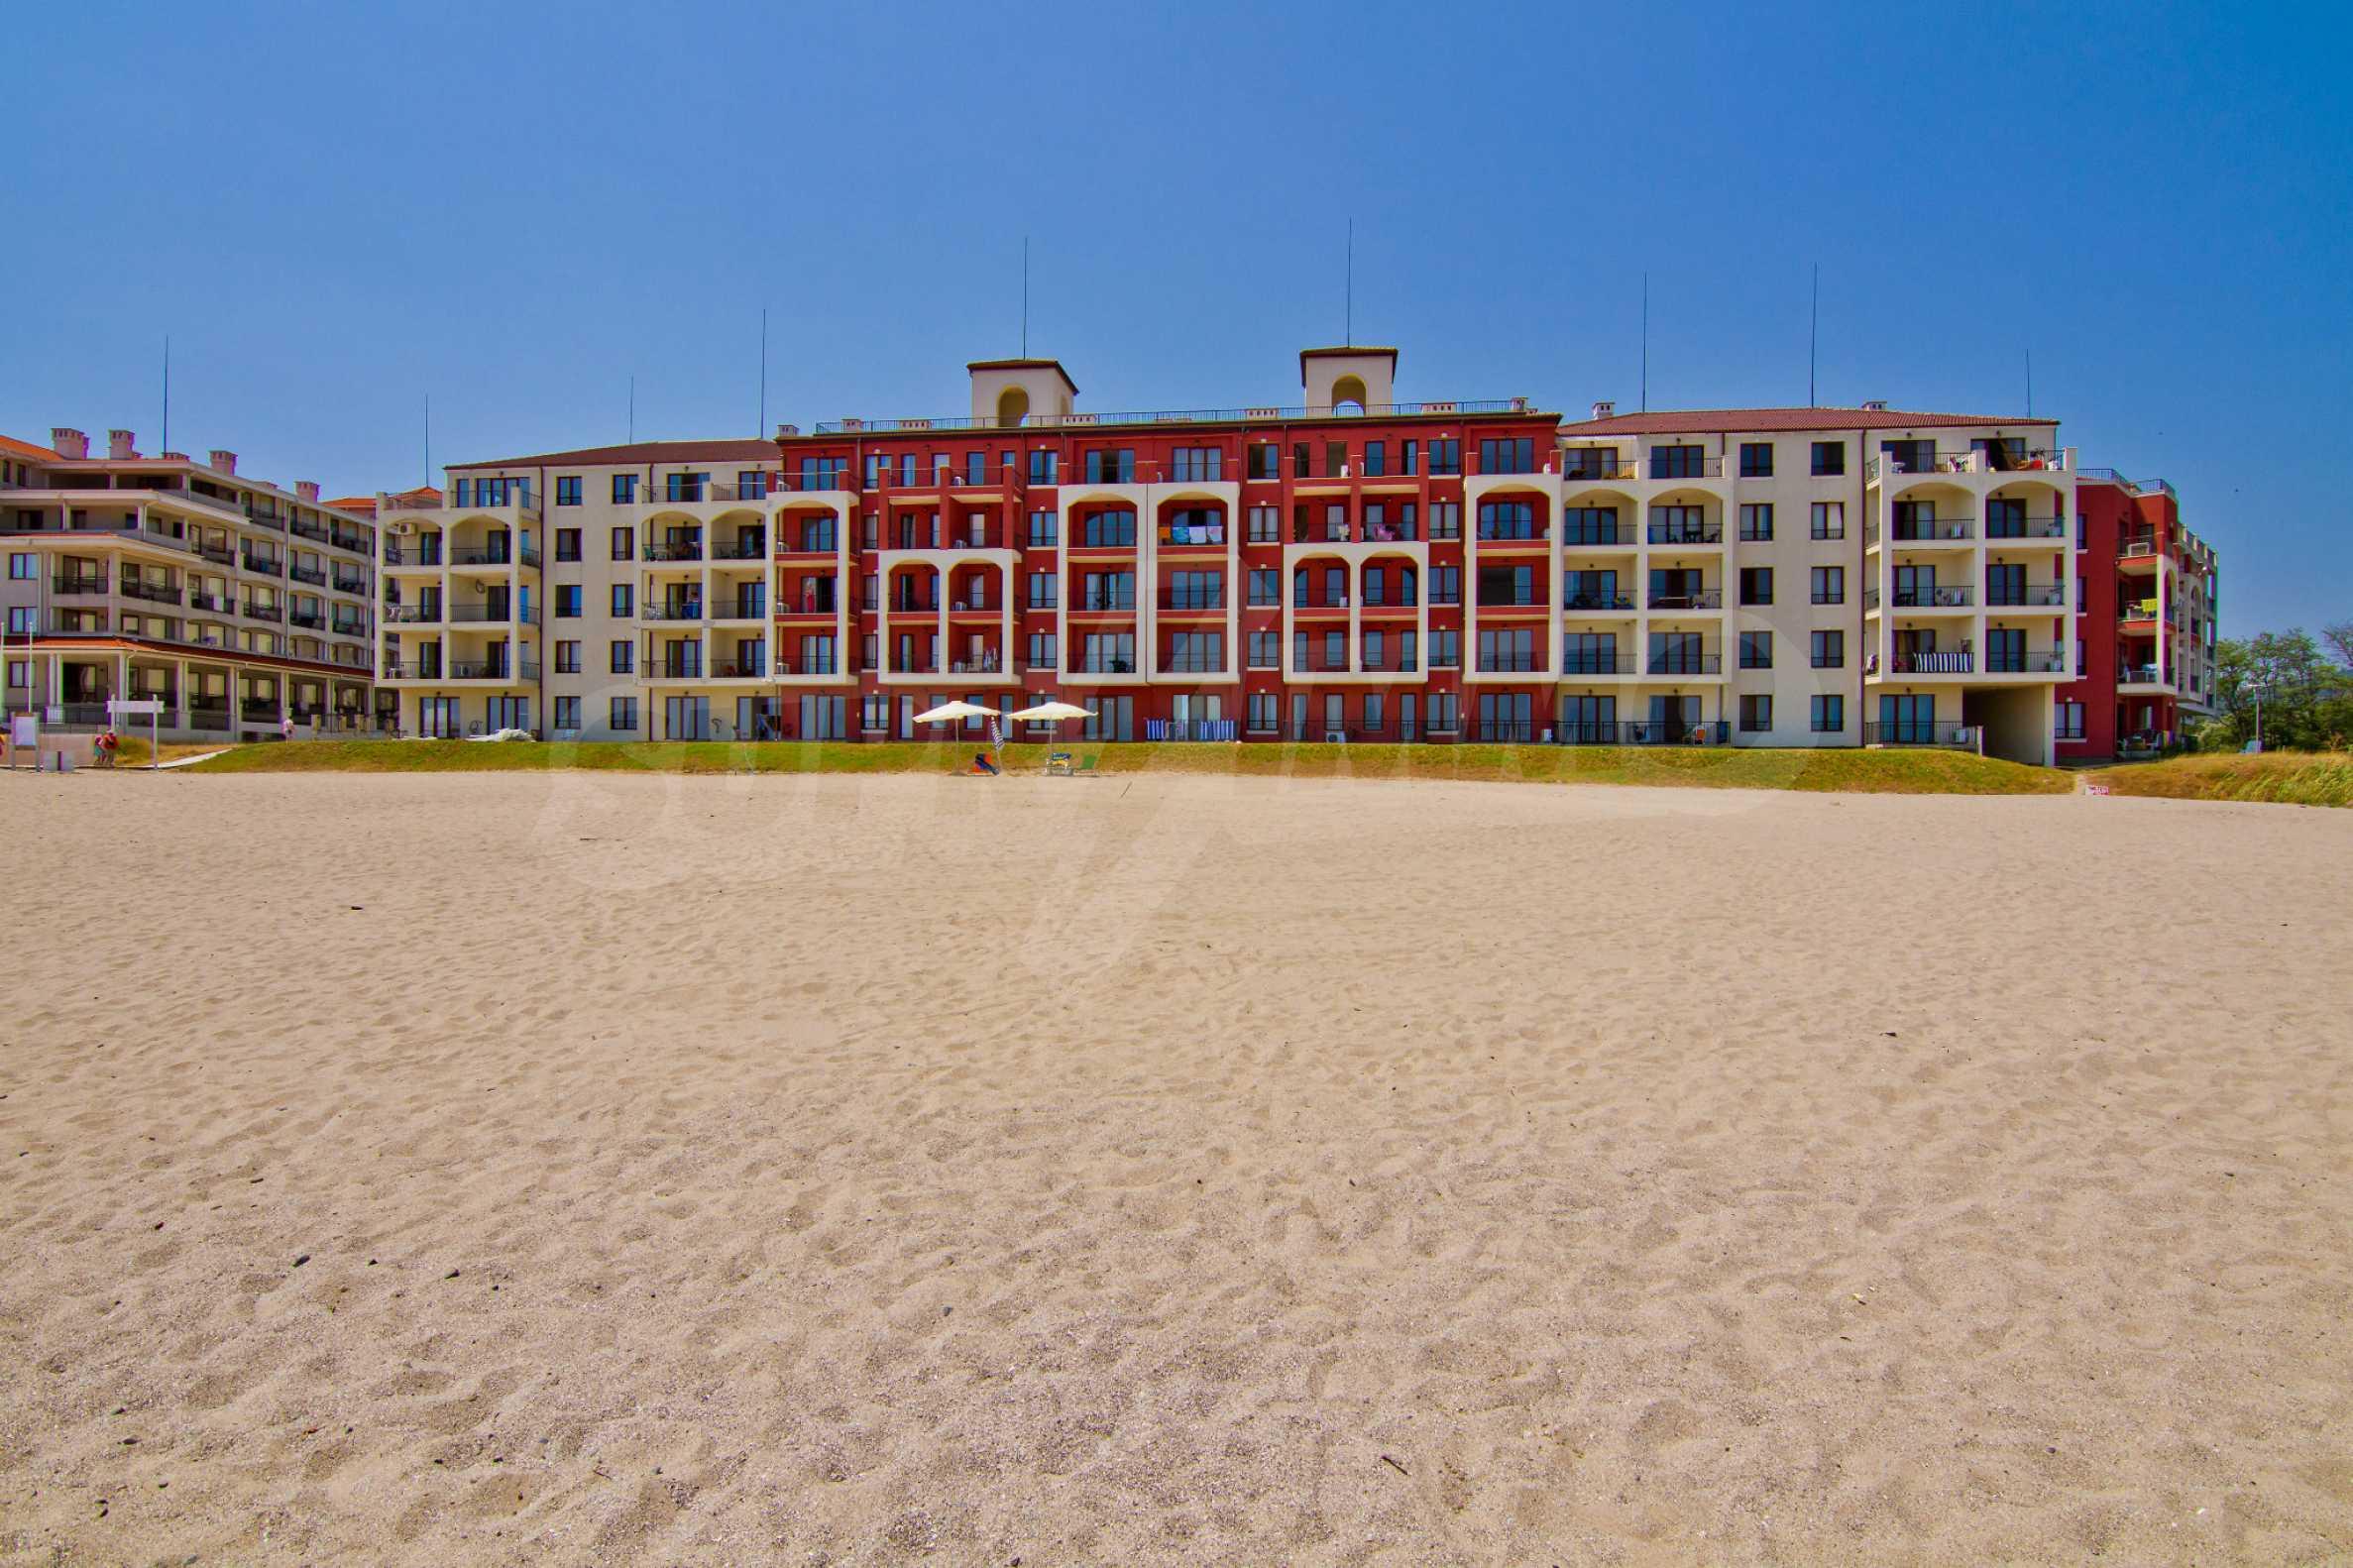 Примеа Бийч Резиденс / Primea Beach Residence 2